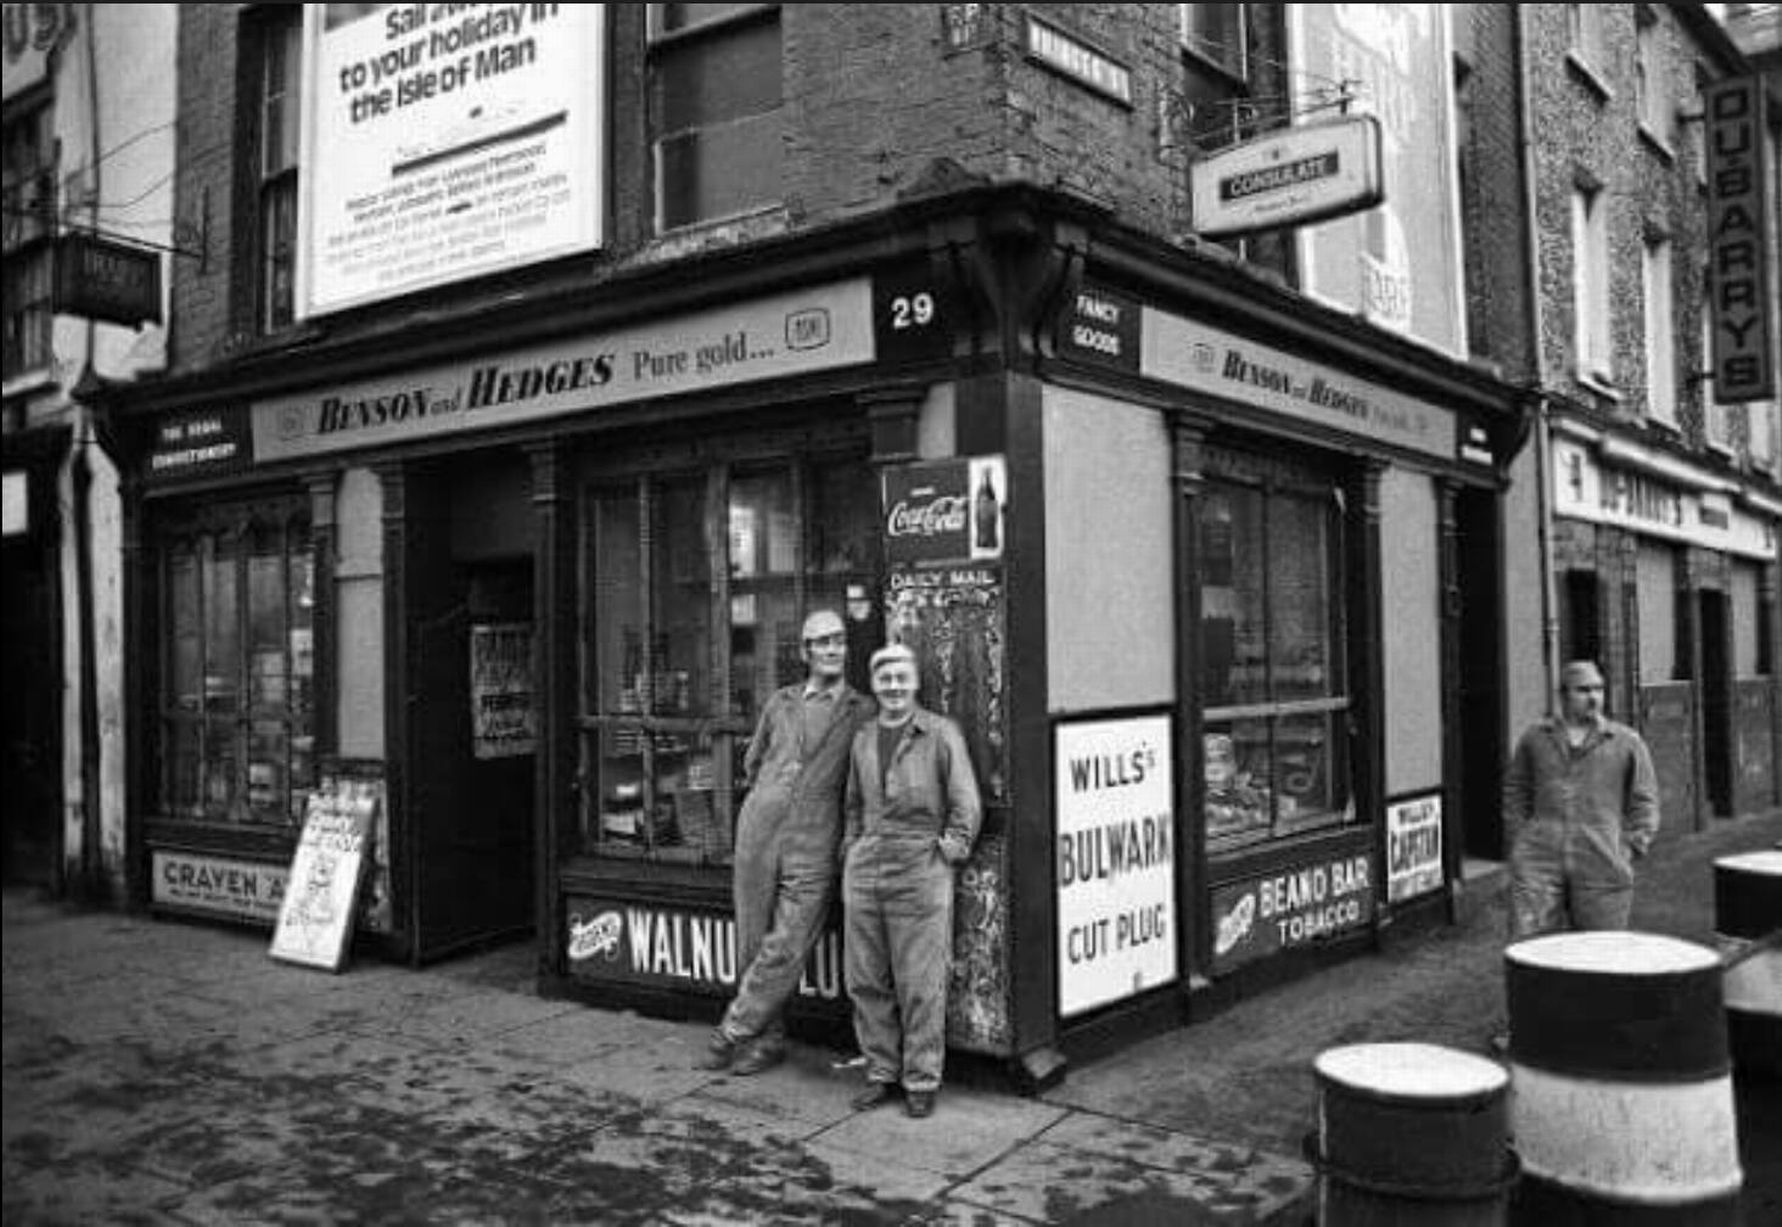 Big Smiles From Belfast Folk